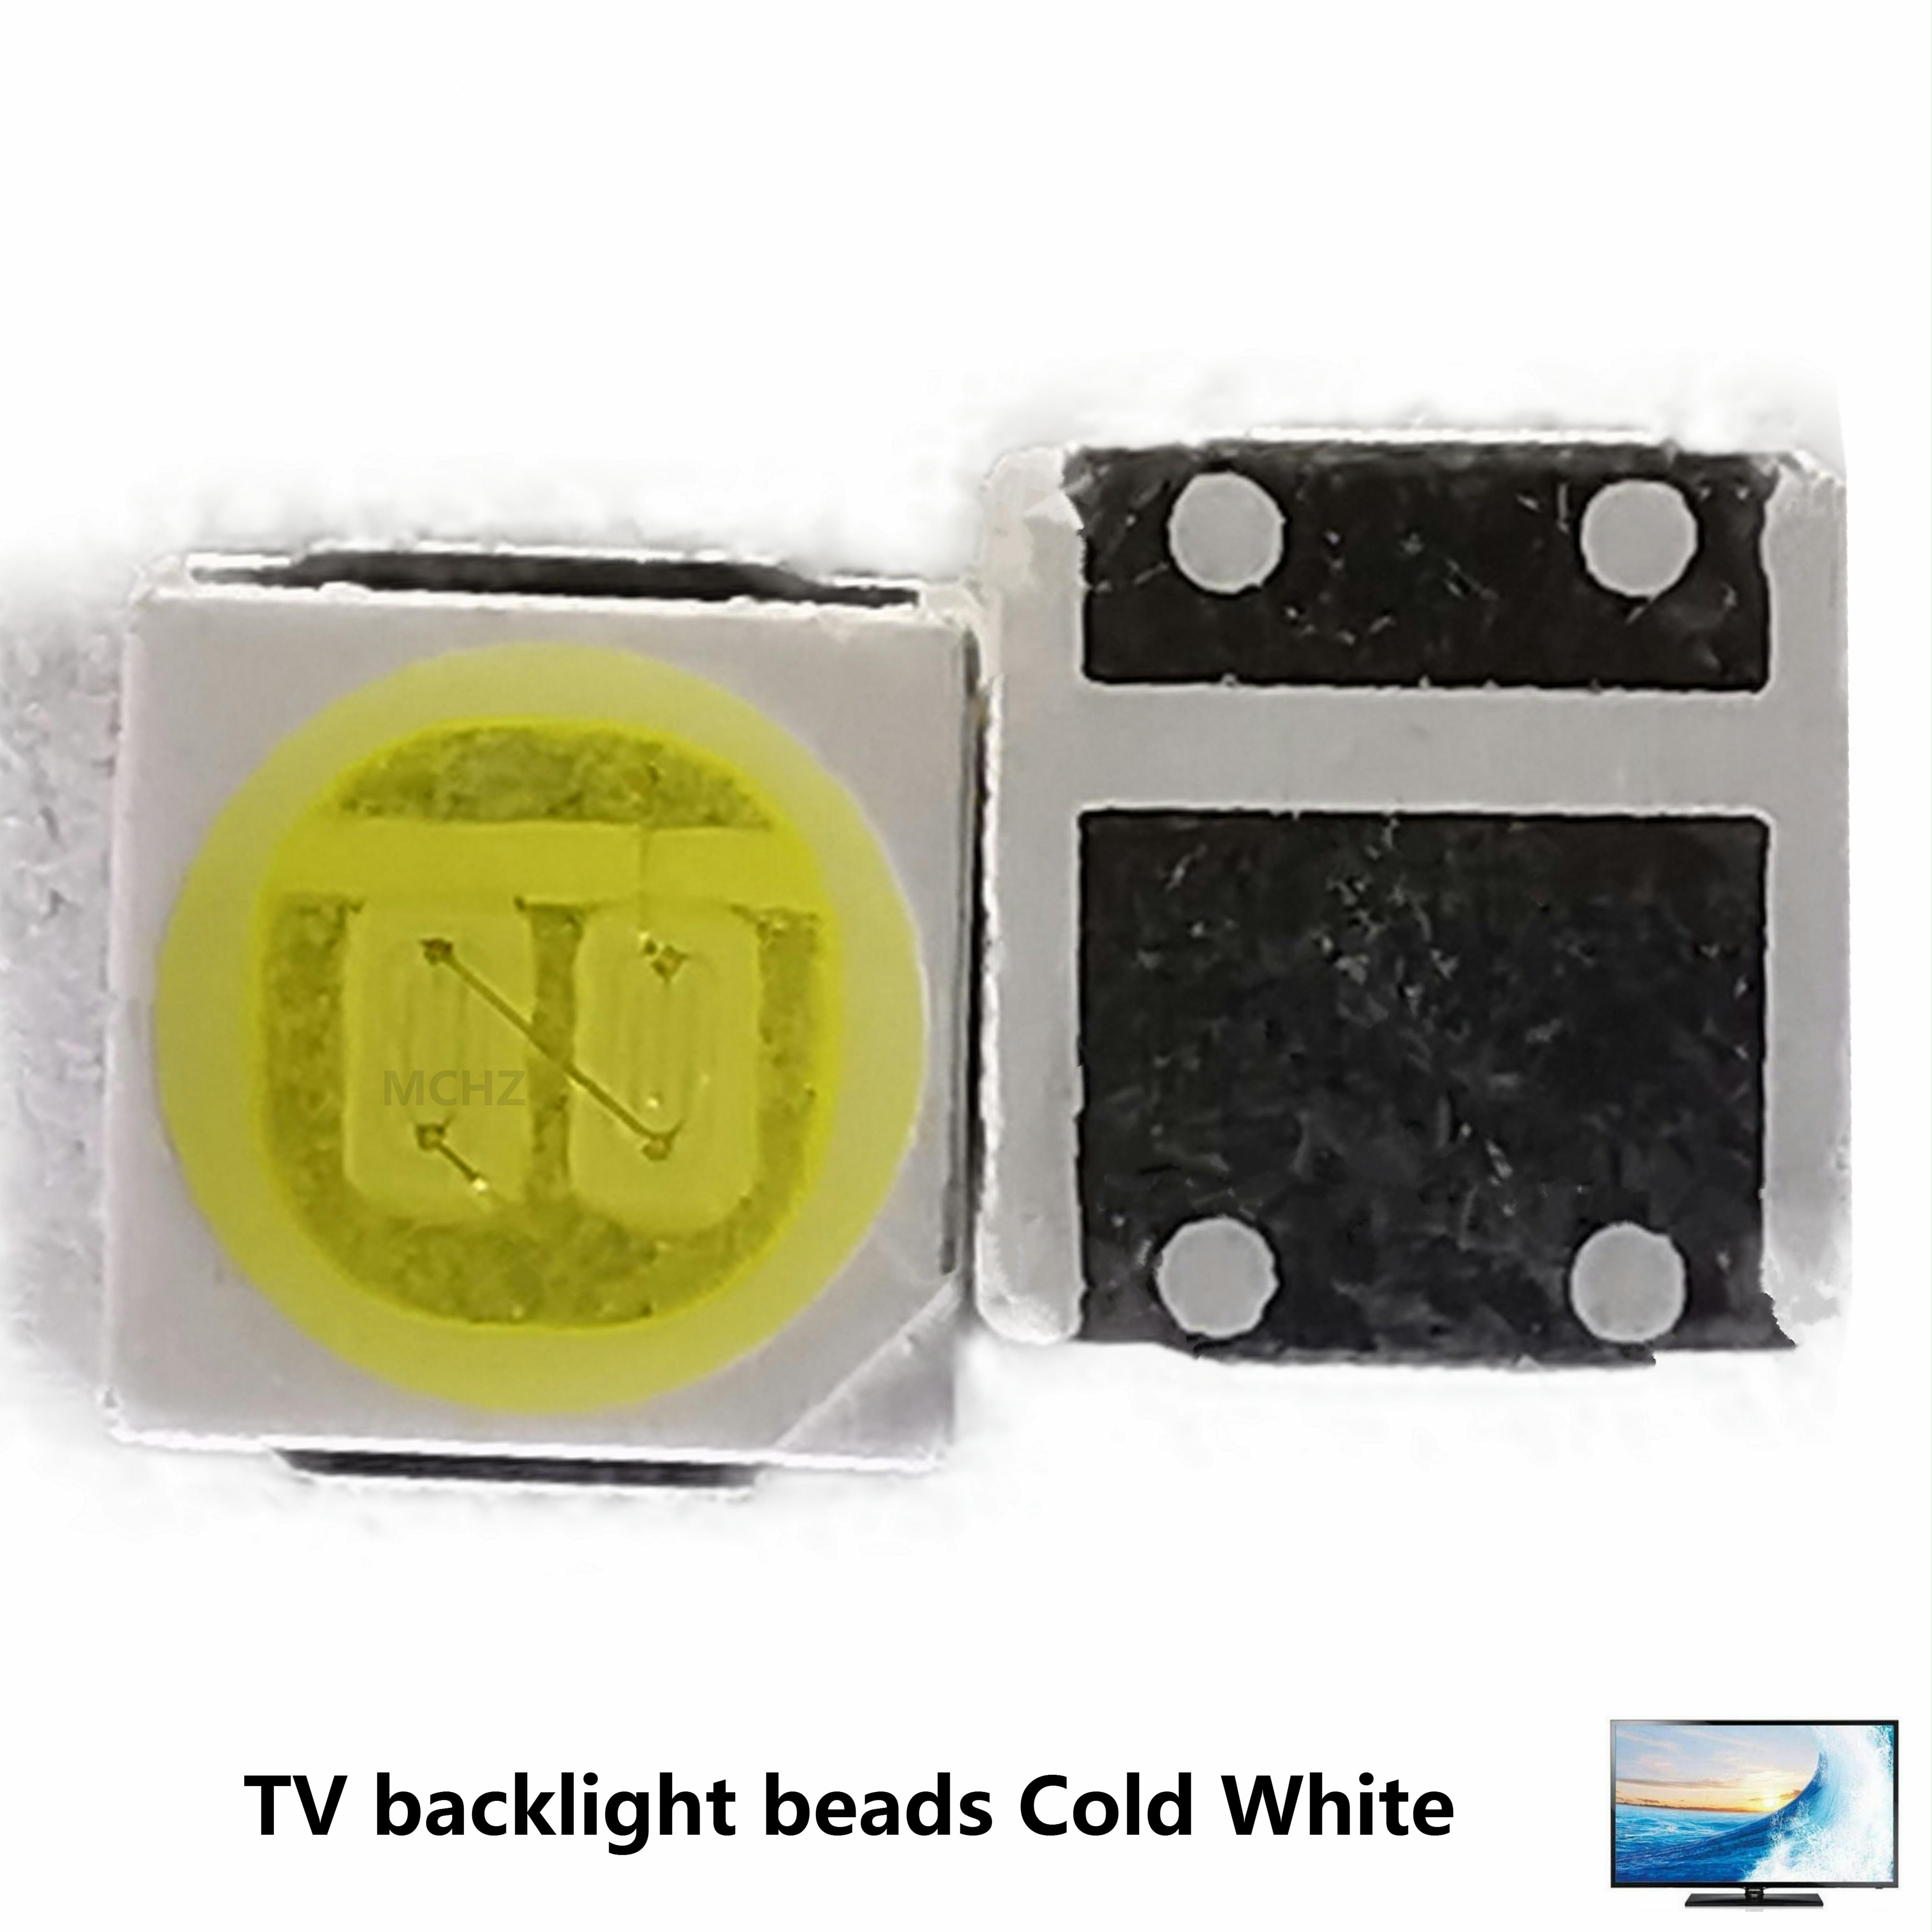 100pcs-factory-biggest-discount-led-backlight-osram-replace-lg-jufei-seoul-3030-3528-2835-6-68v-2w-210lm-cool-white-300ma